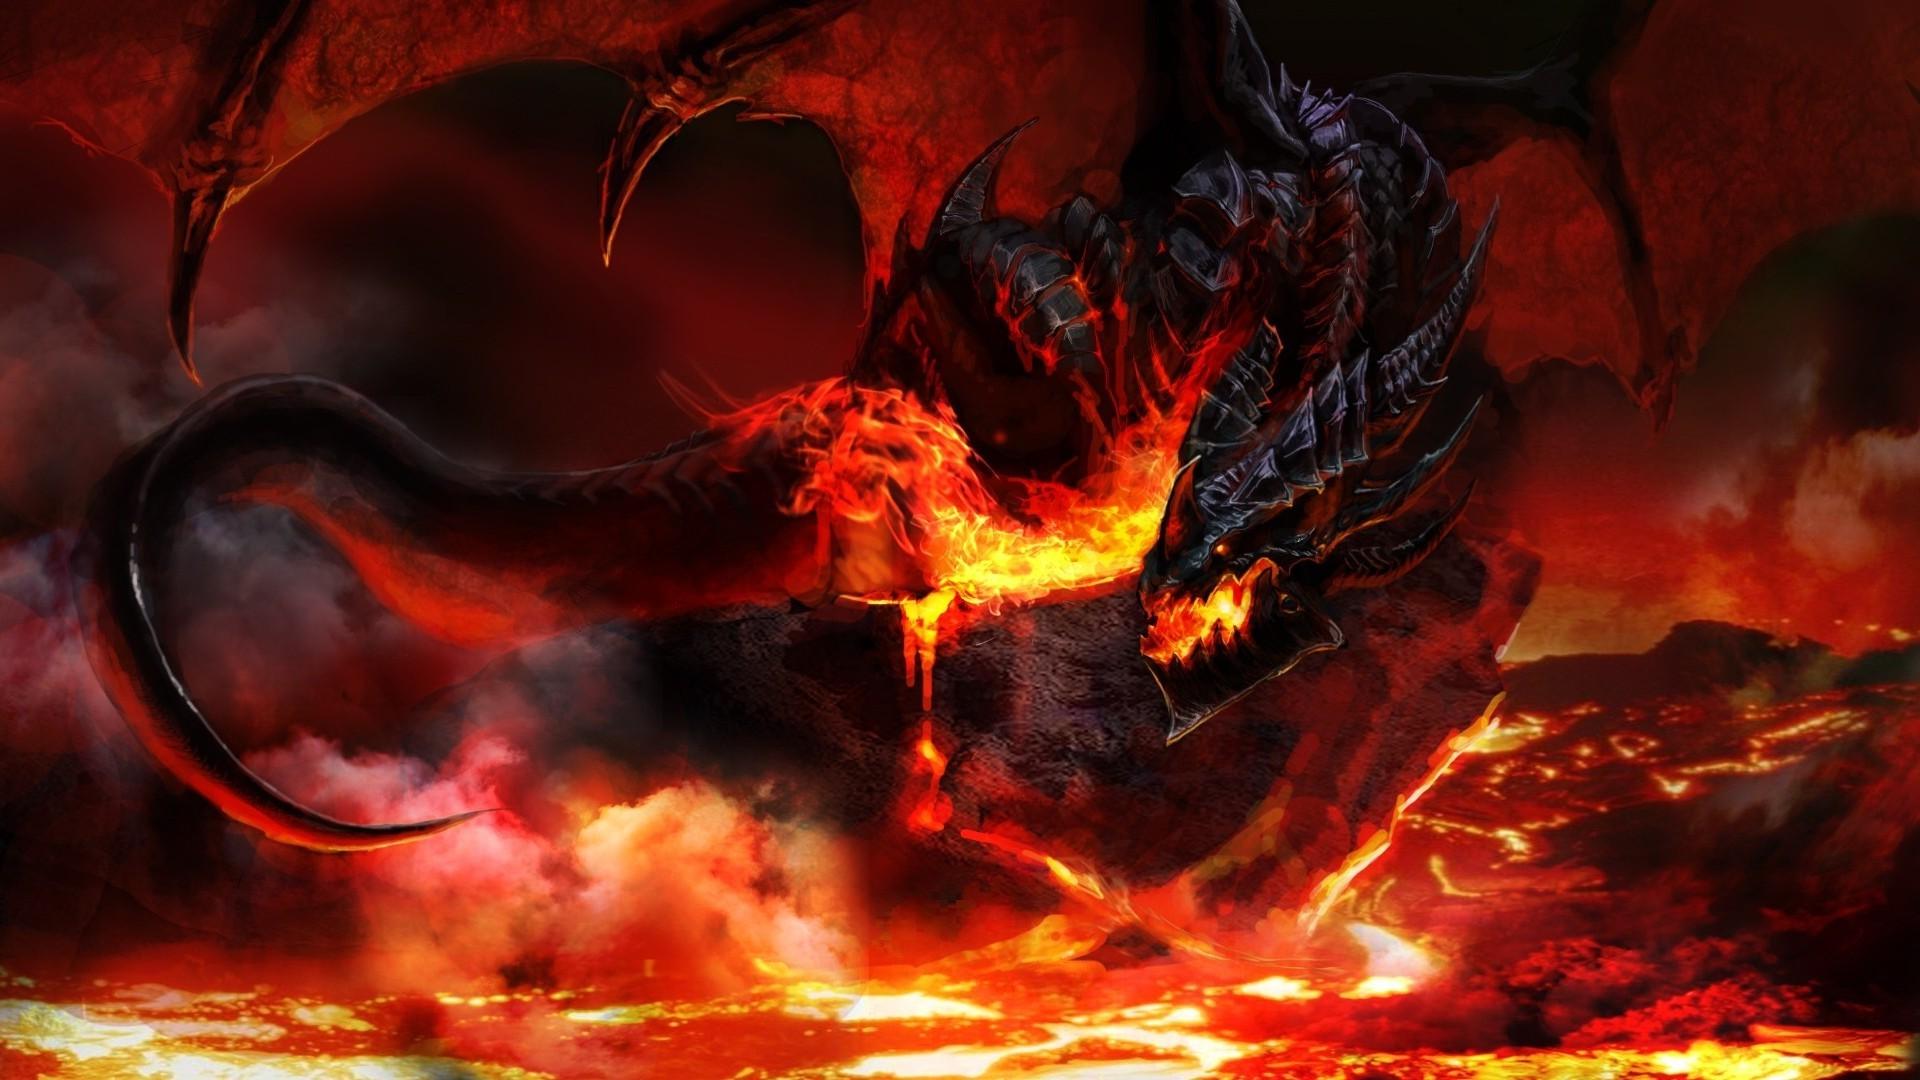 Wallpaper 1920x1080 Px Deathwing Dragon Dragon Wings Fantasy